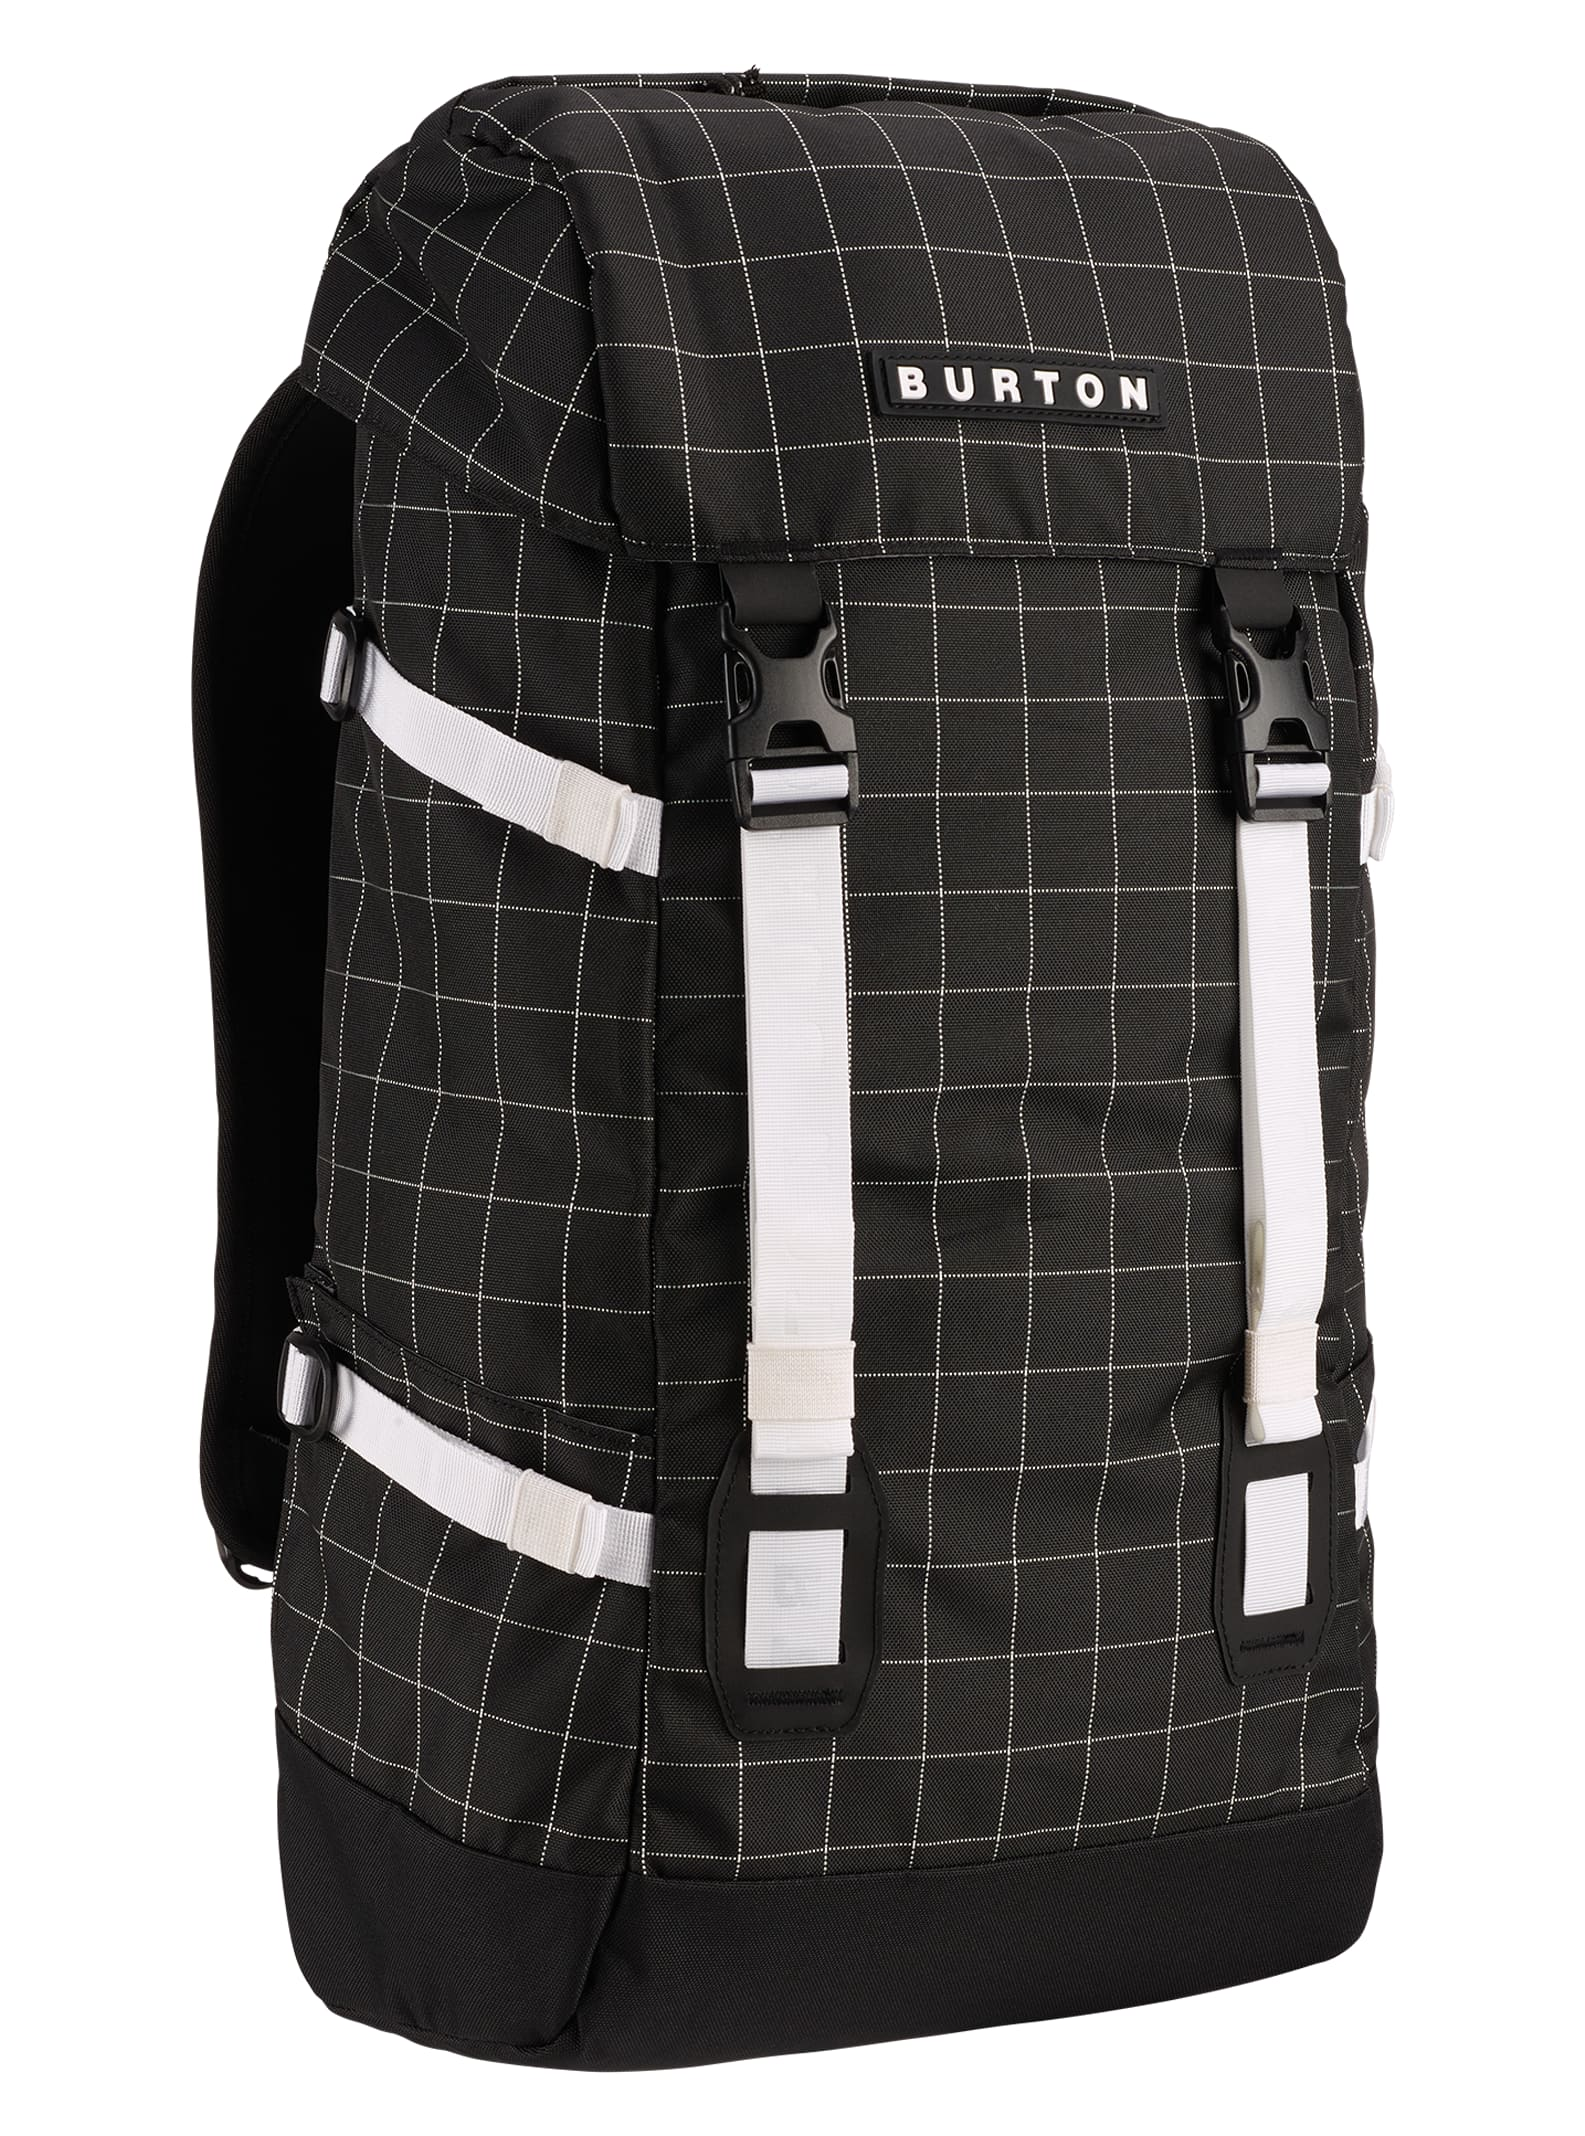 a3b535c0f Backpacks   Burton Snowboards